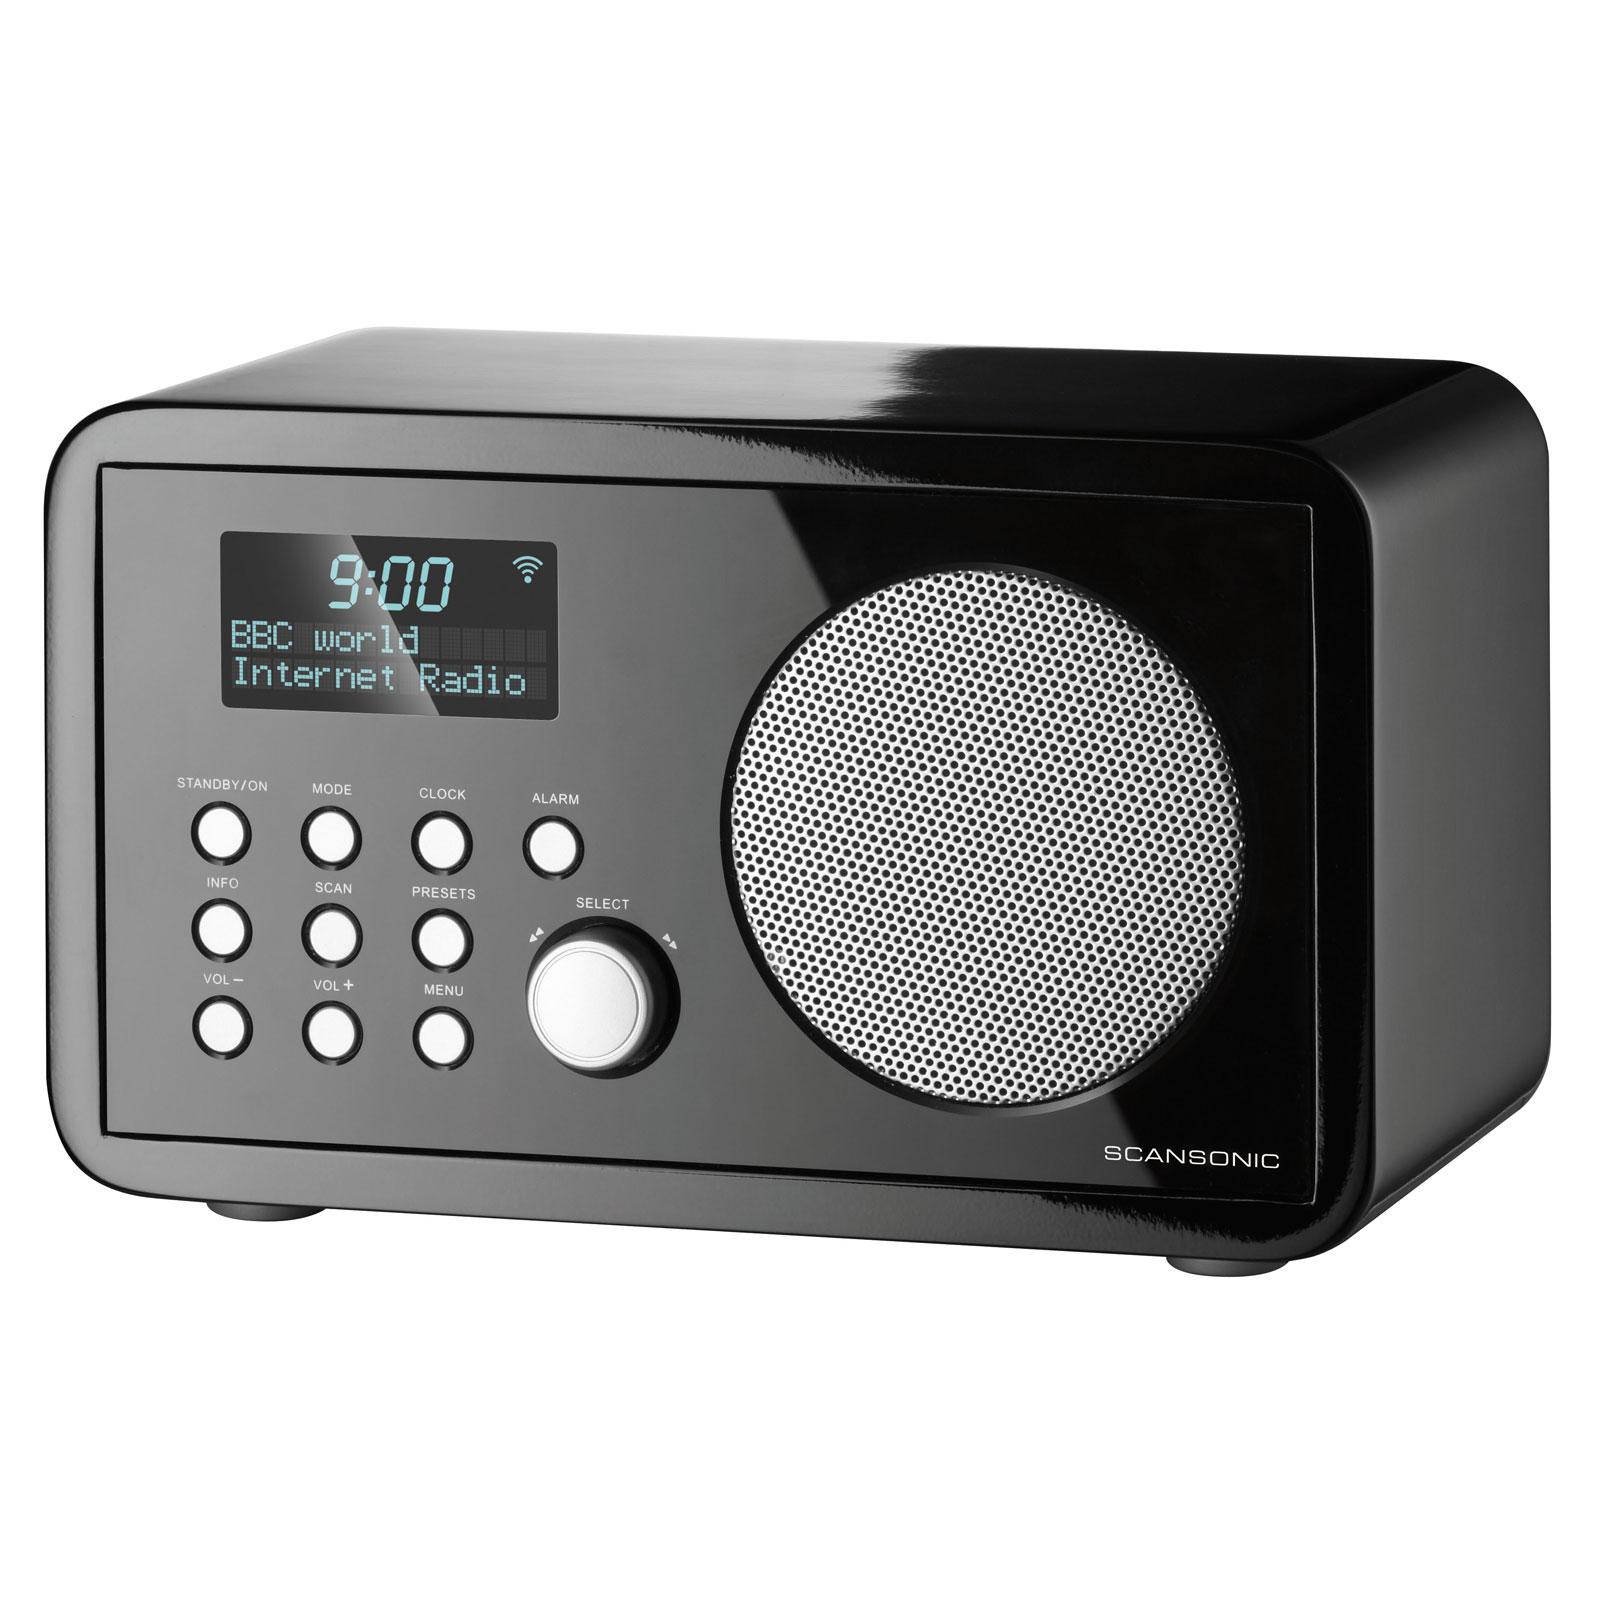 scansonic in210 noir radio radio r veil scansonic sur. Black Bedroom Furniture Sets. Home Design Ideas